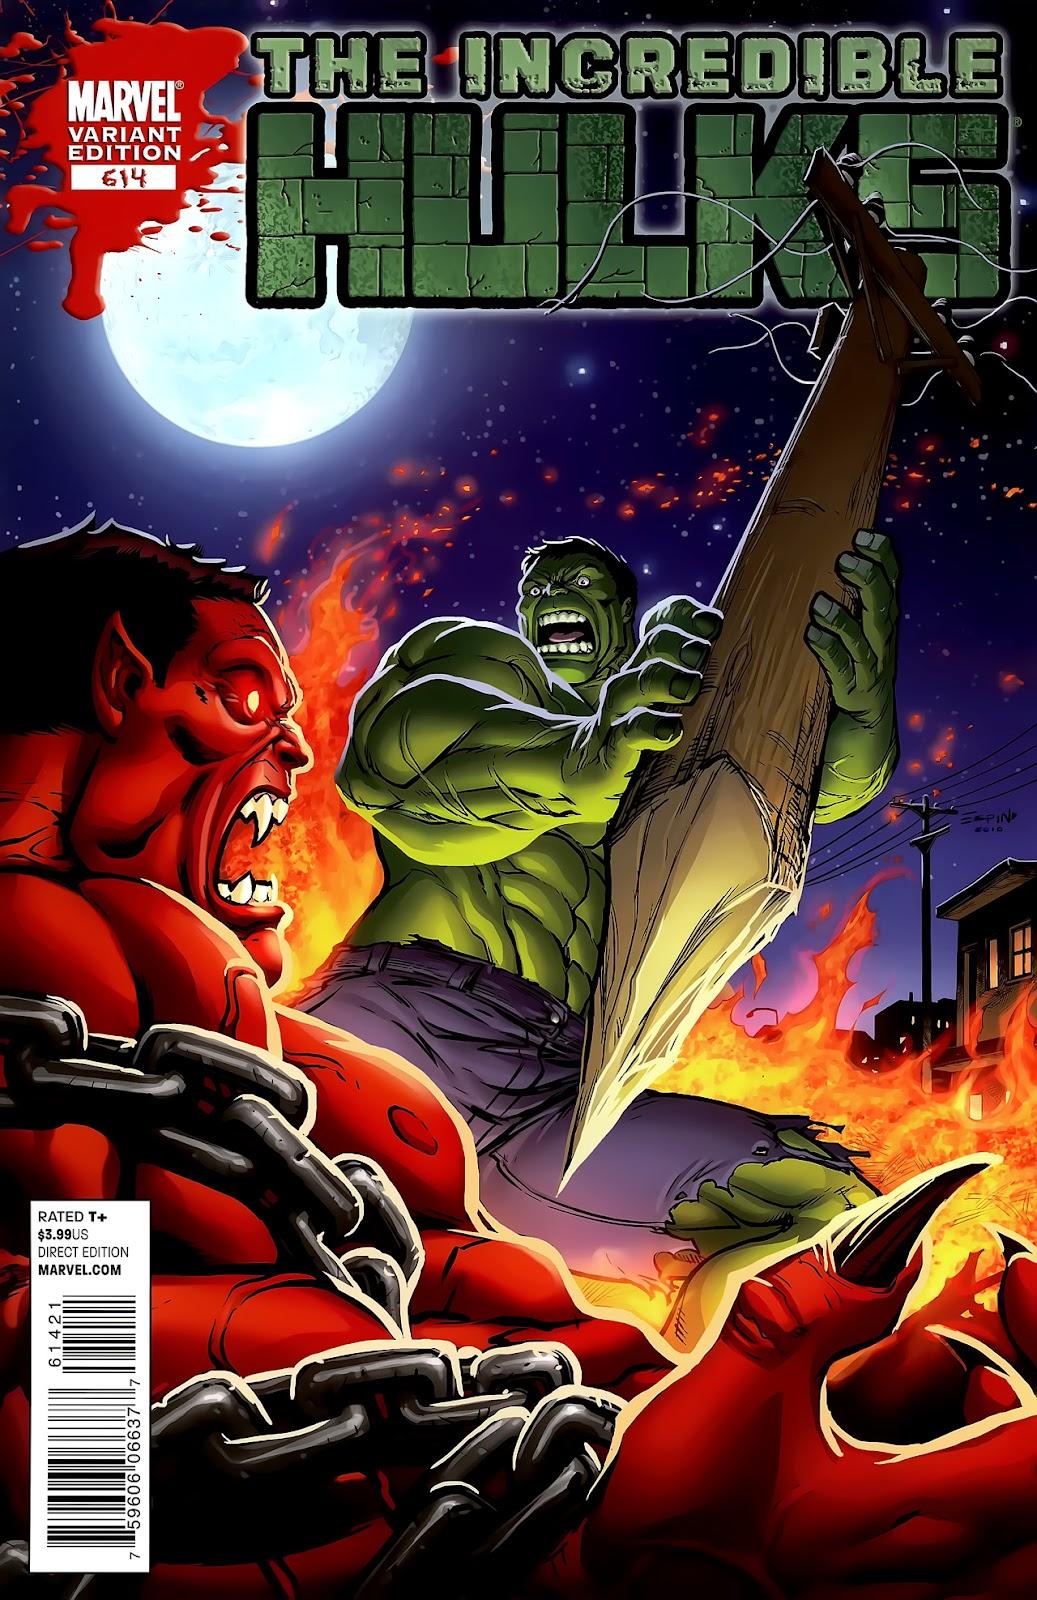 Incredible Hulks (2010) Issue #614 #4 - English 2